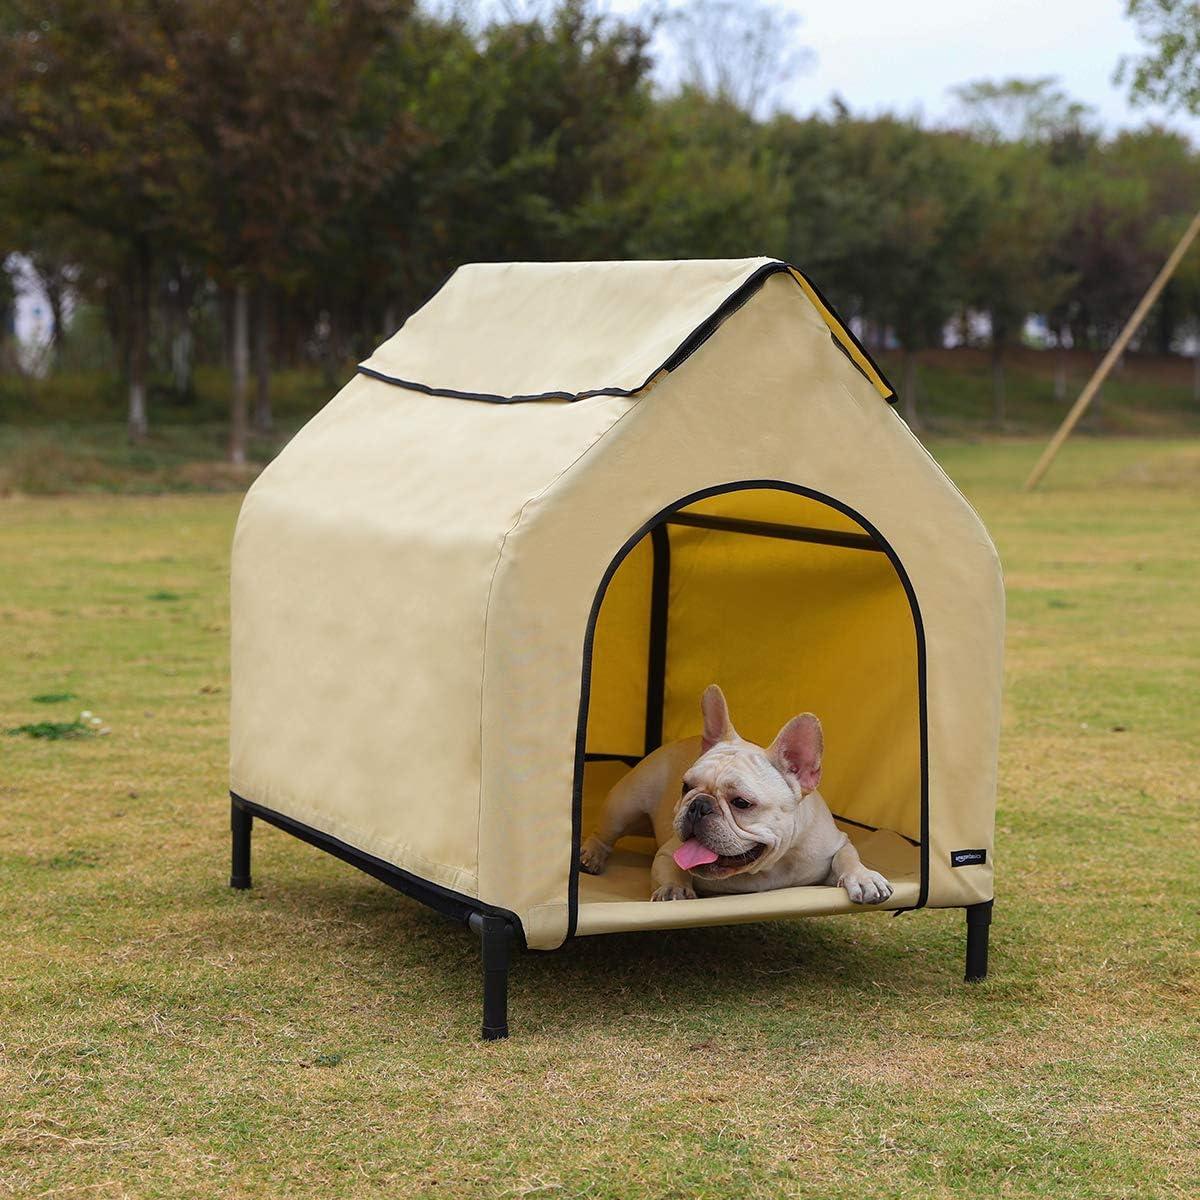 AmazonBasics - Caseta para mascotas, elevada, portátil, pequeña, caqui